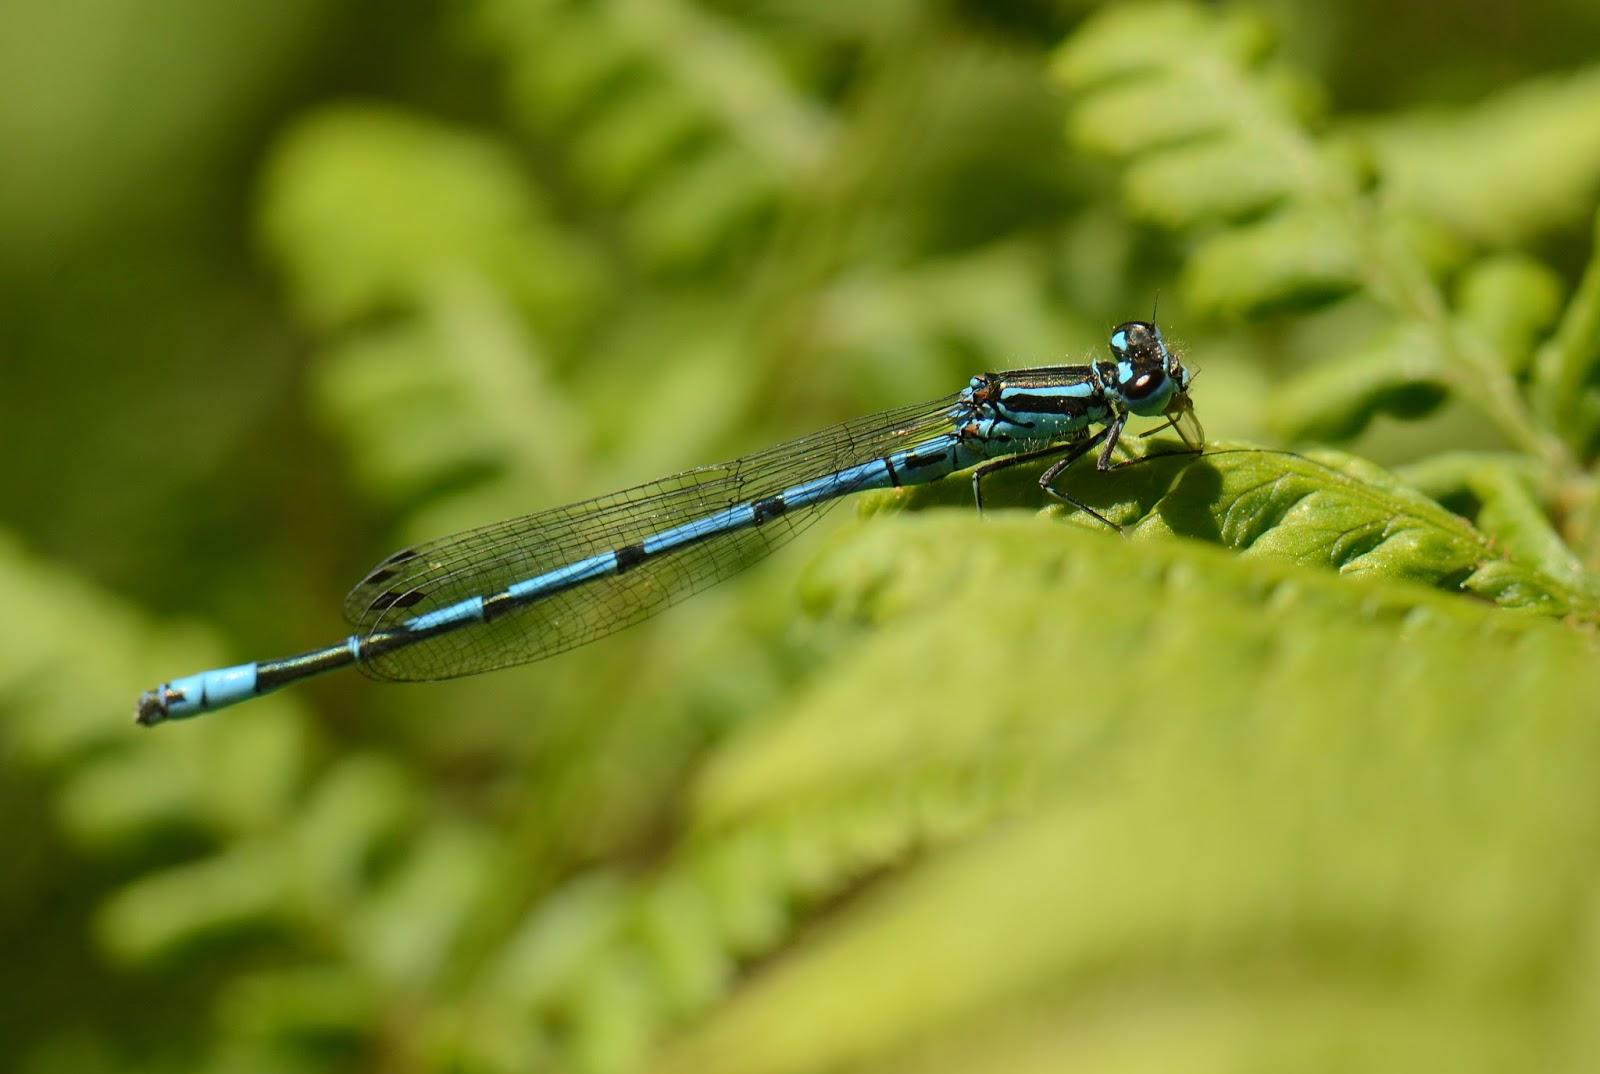 azure damsel flies fly - photo #15